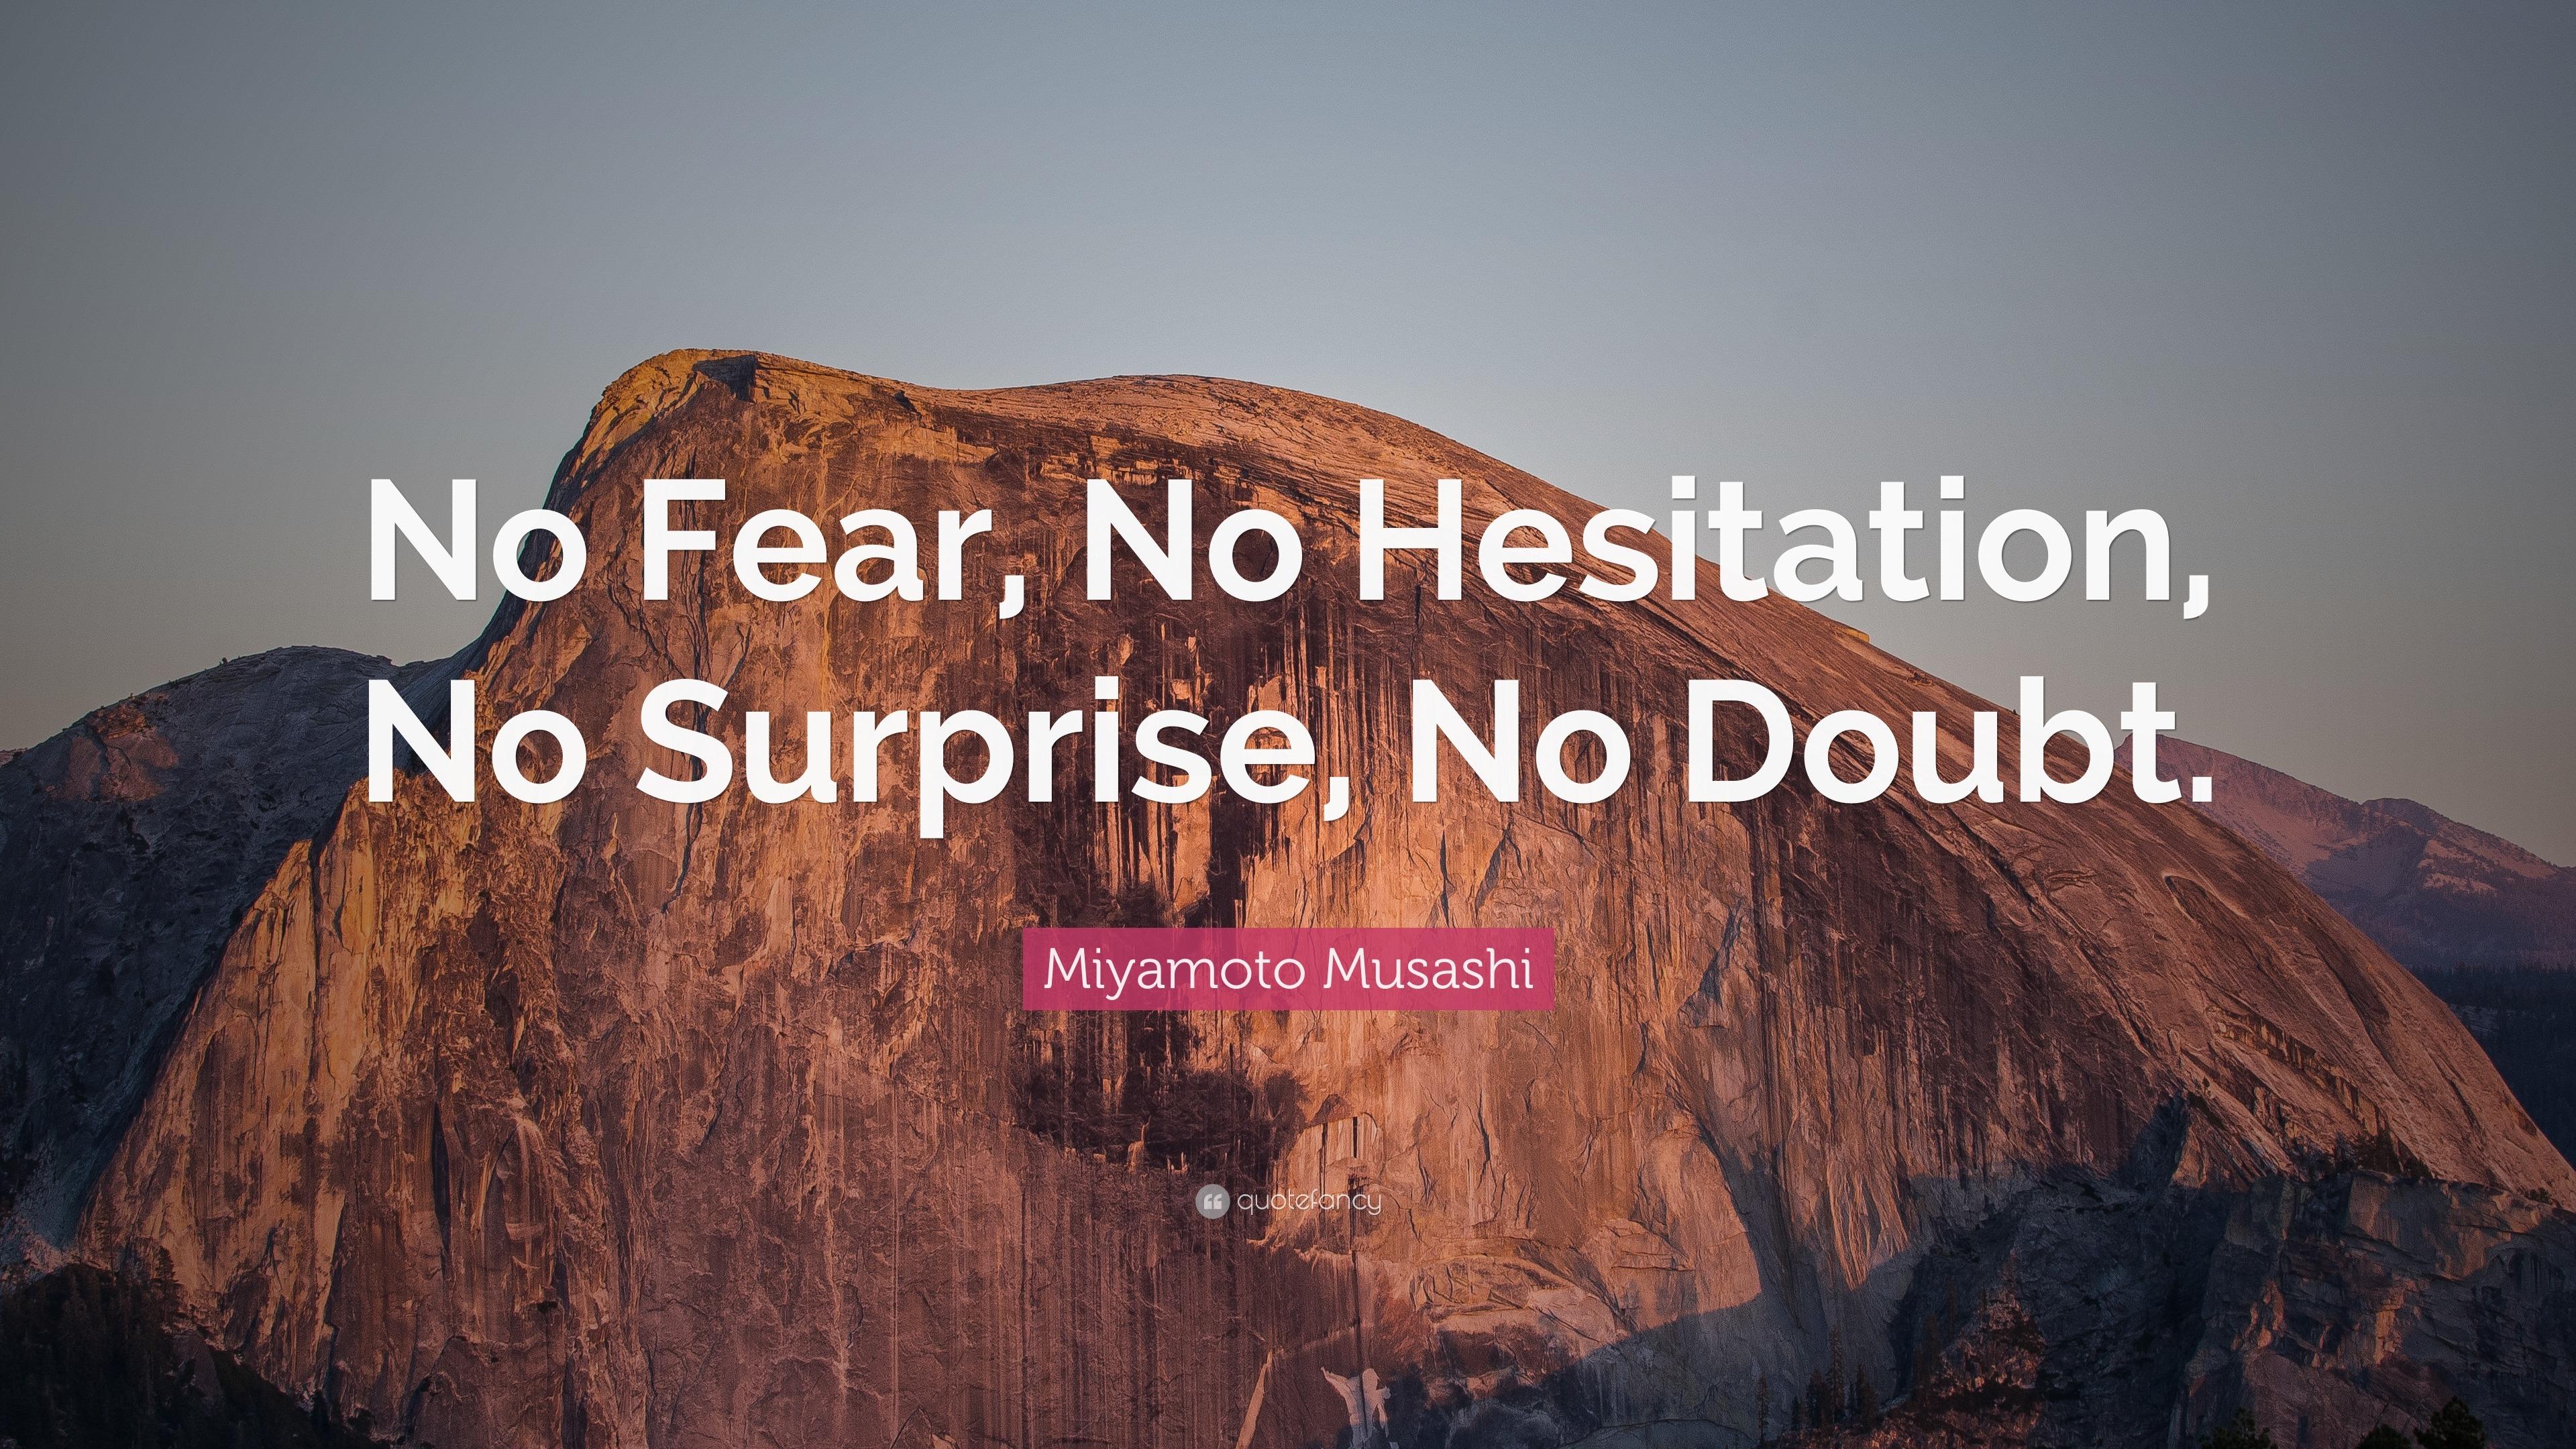 Theodore Roosevelt Quotes Wallpaper Miyamoto Musashi Quote No Fear No Hesitation No